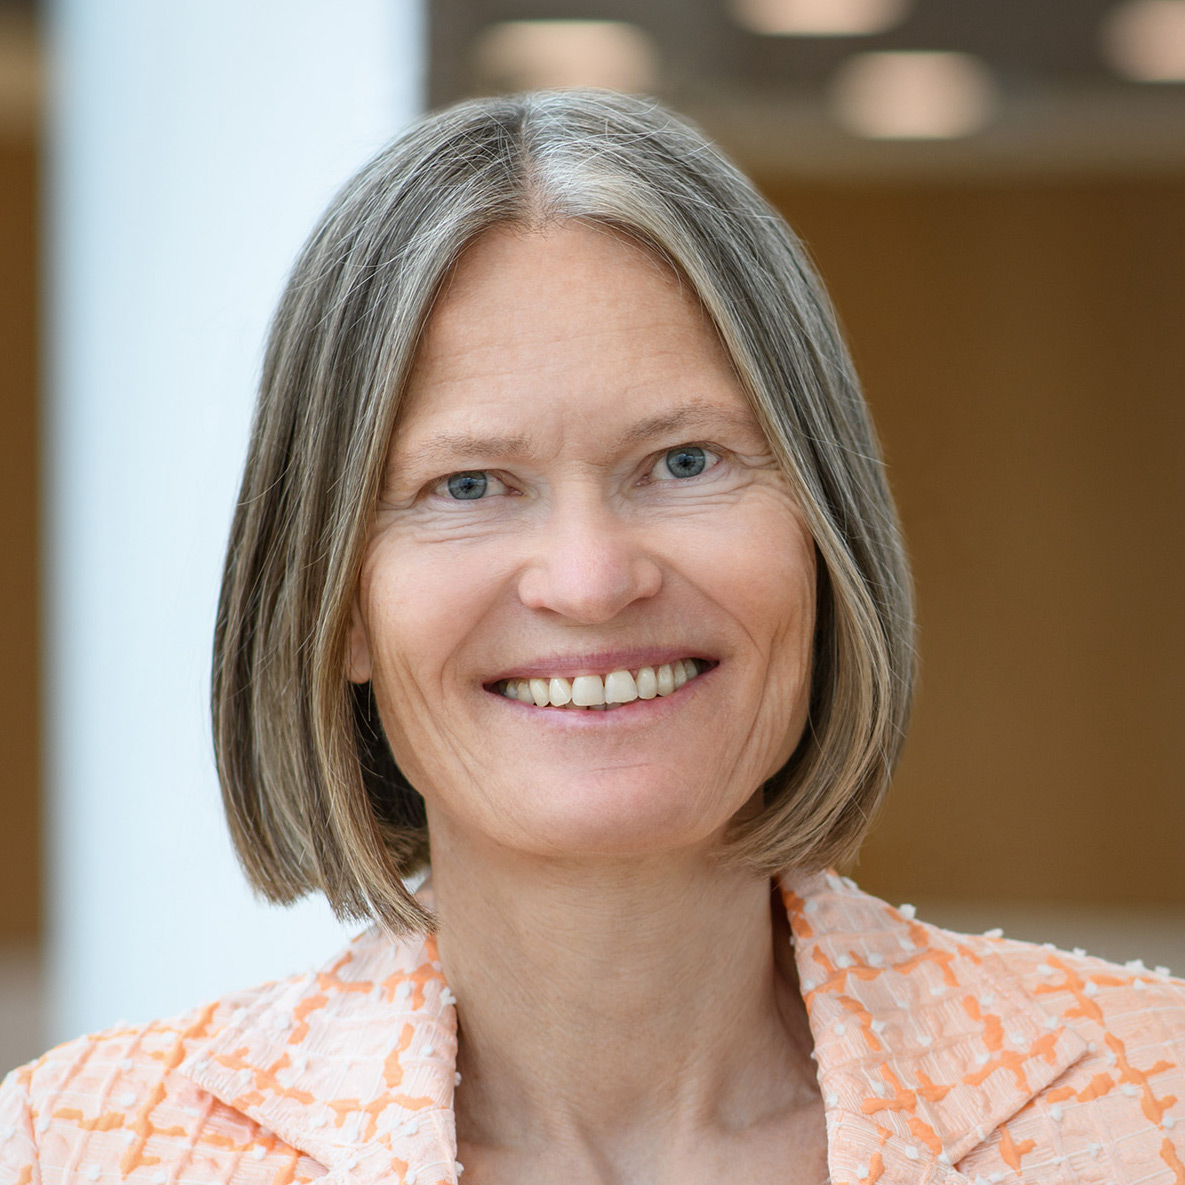 Prof. Dr. Dr. h.c. Anne Peters, LL.M. (Harvard)